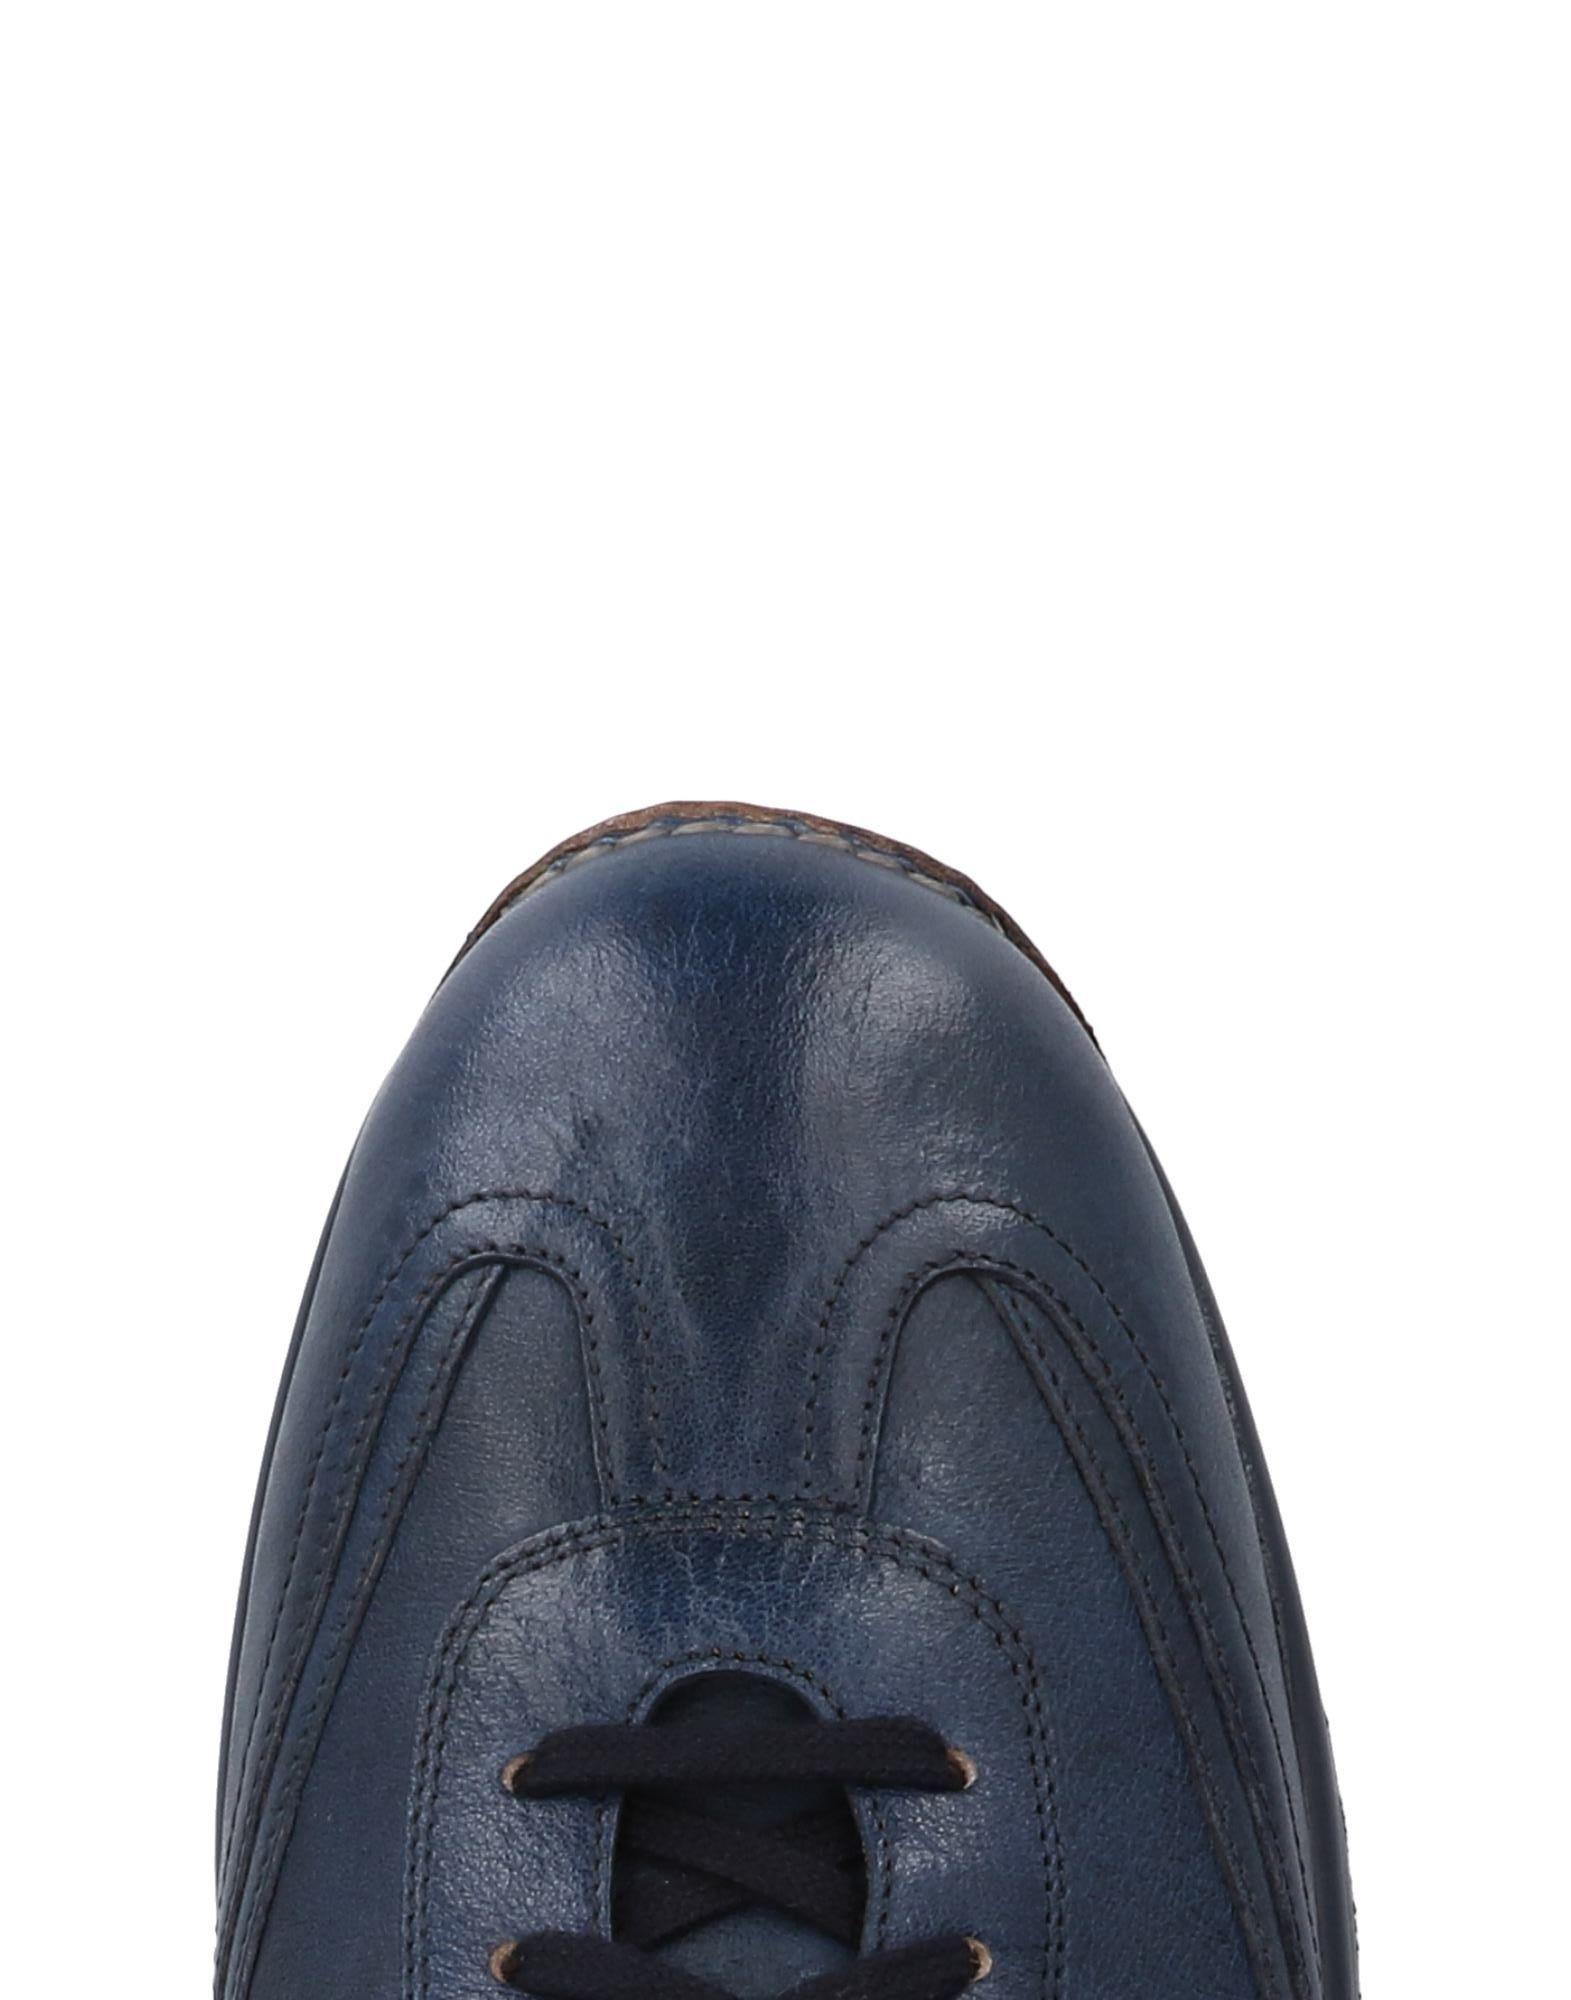 Santoni Sneakers Herren  11478760BU Schuhe Gute Qualität beliebte Schuhe 11478760BU c8cb55